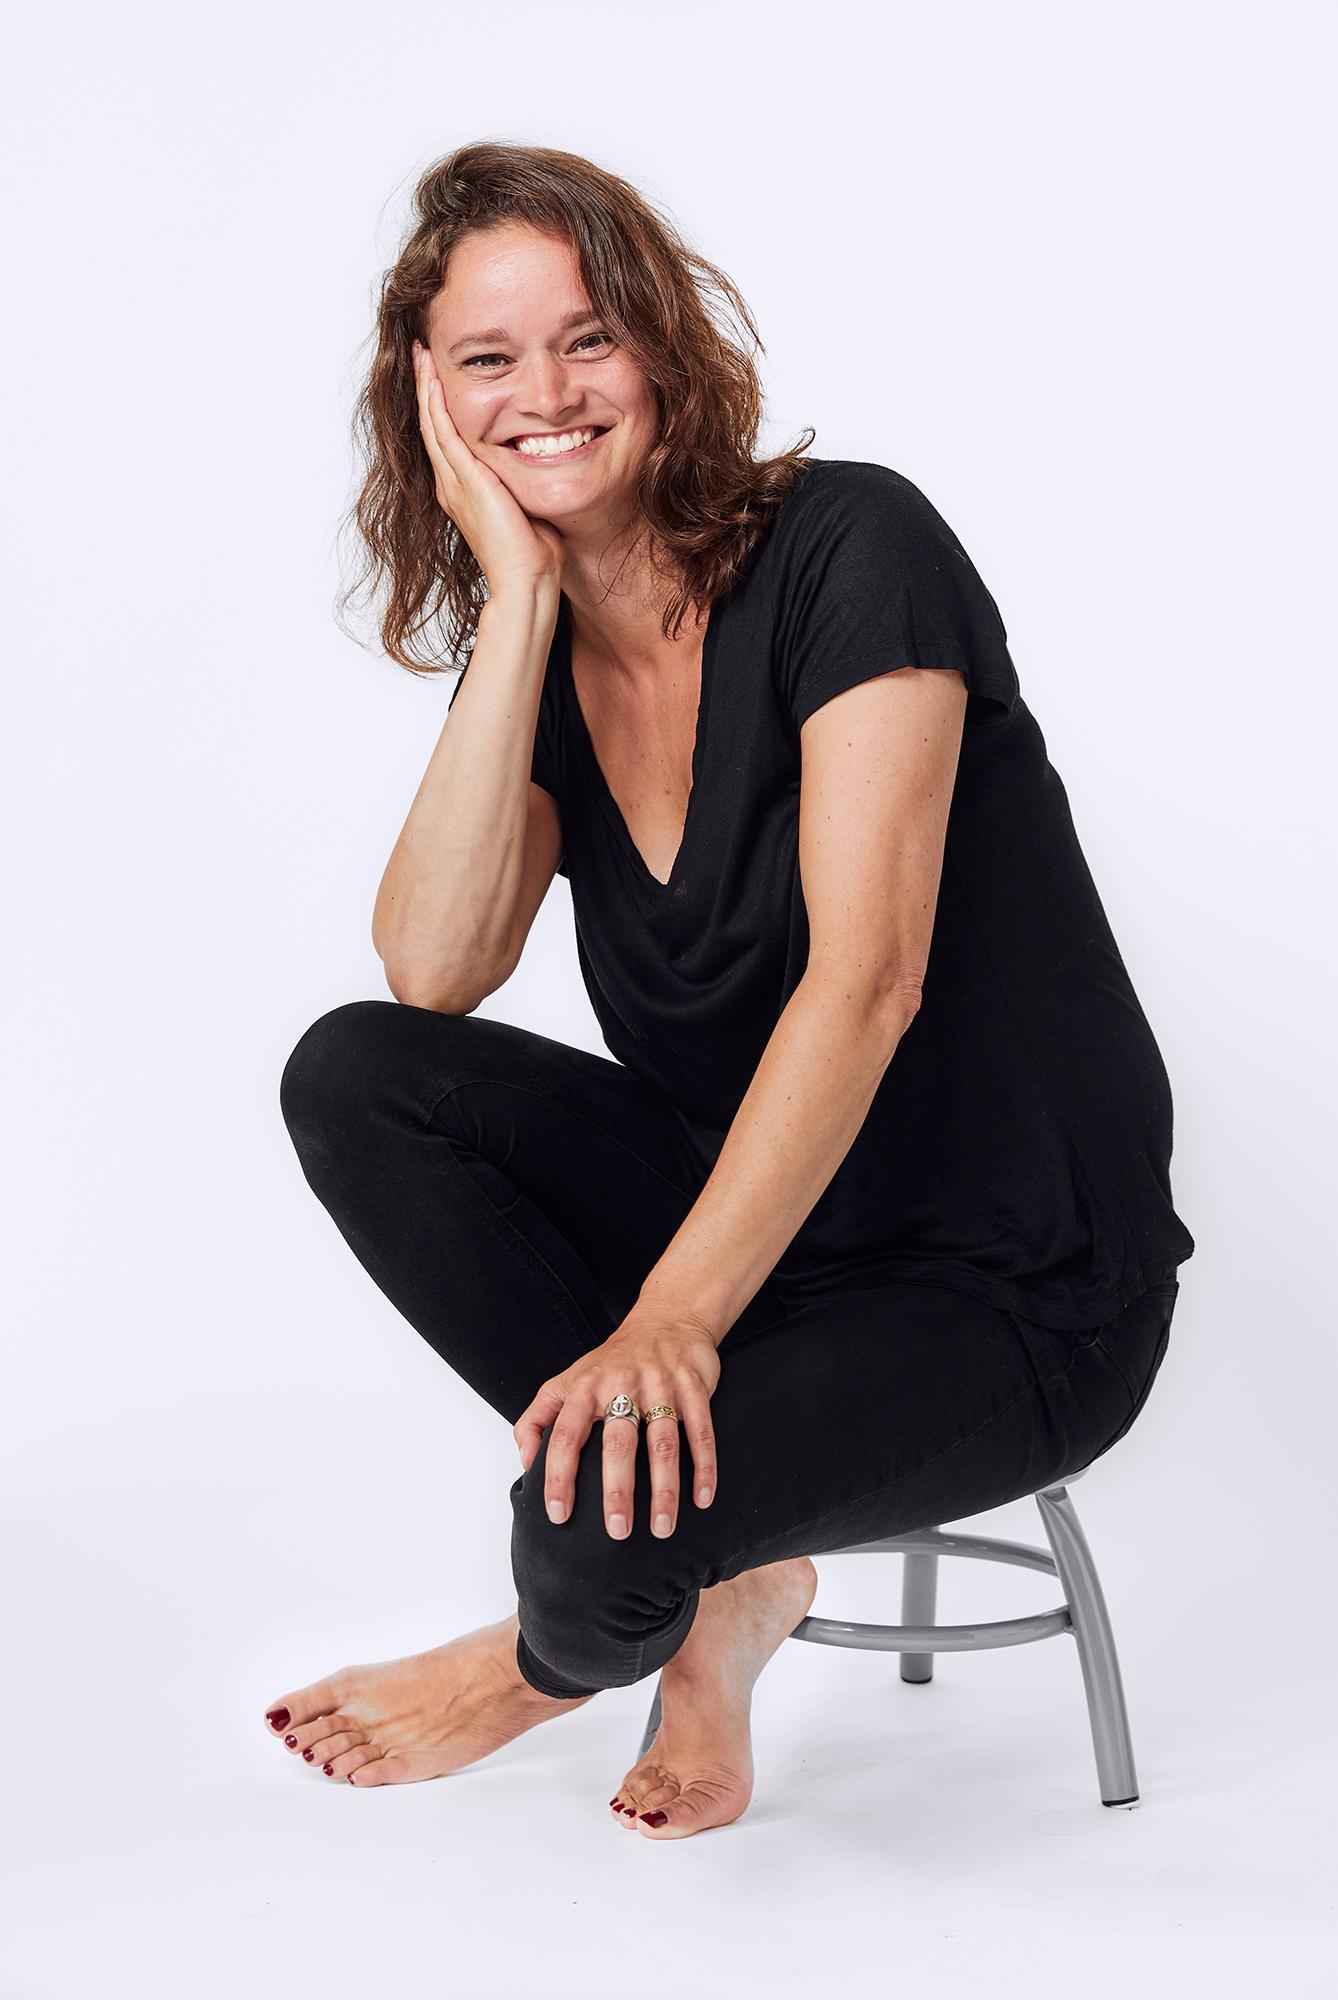 Annemarie-reilingh-haptotherapie-holistic-pelvic-care-hormoon-balans-shoot2.jpg